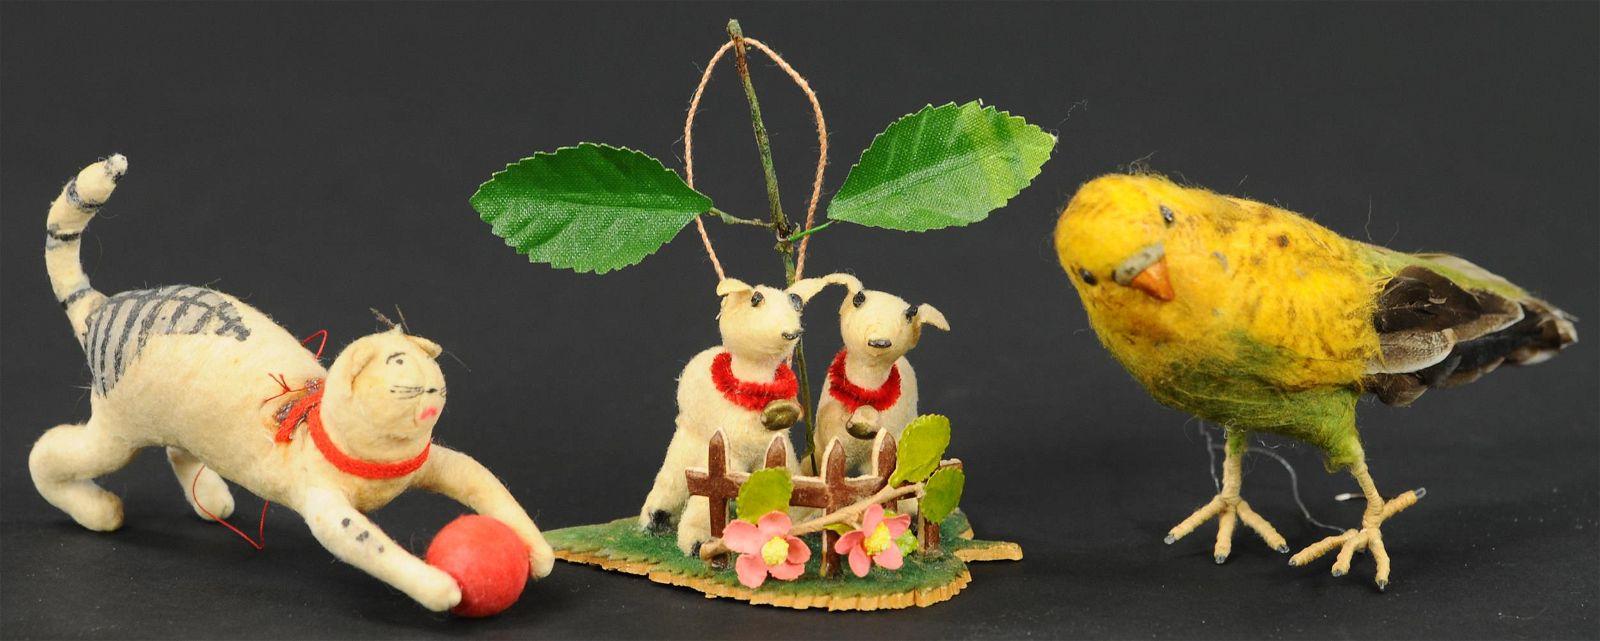 THREE WHIMSICAL COTTON CHRISTMAS TREE ORNAMENTS